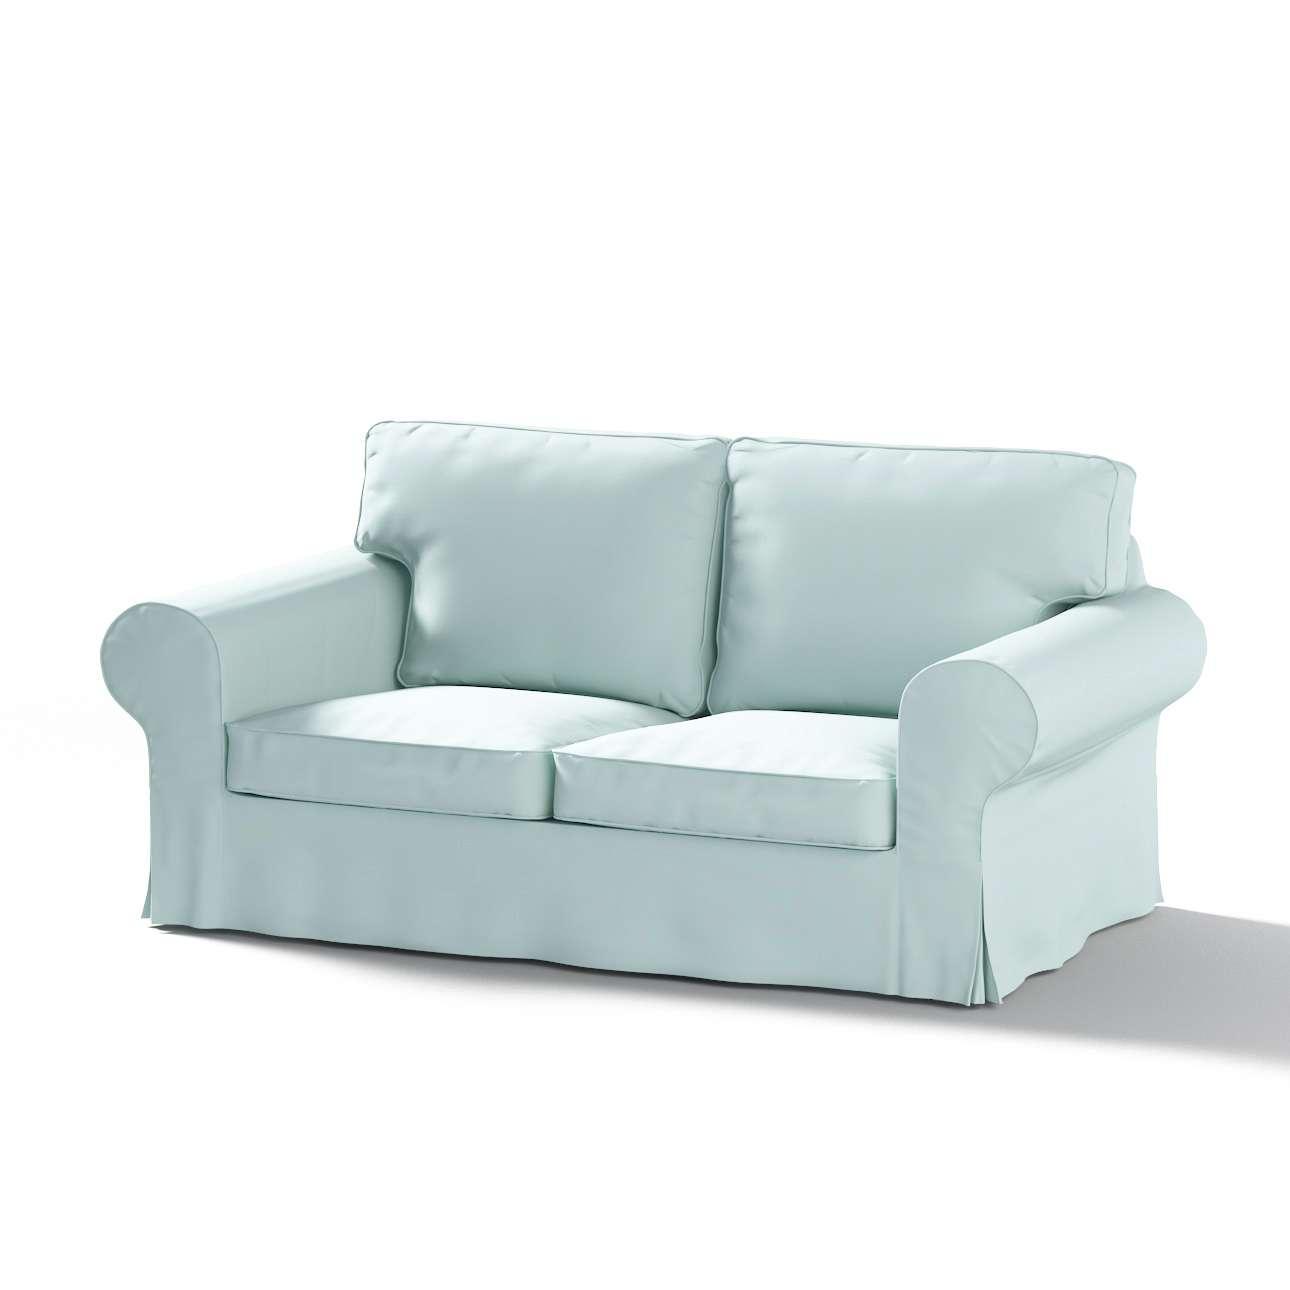 Ektorp betræk 2 sæder sovesofa gammel model<br/>Bredde ca 195cm fra kollektionen Cotton Panama, Stof: 702-10